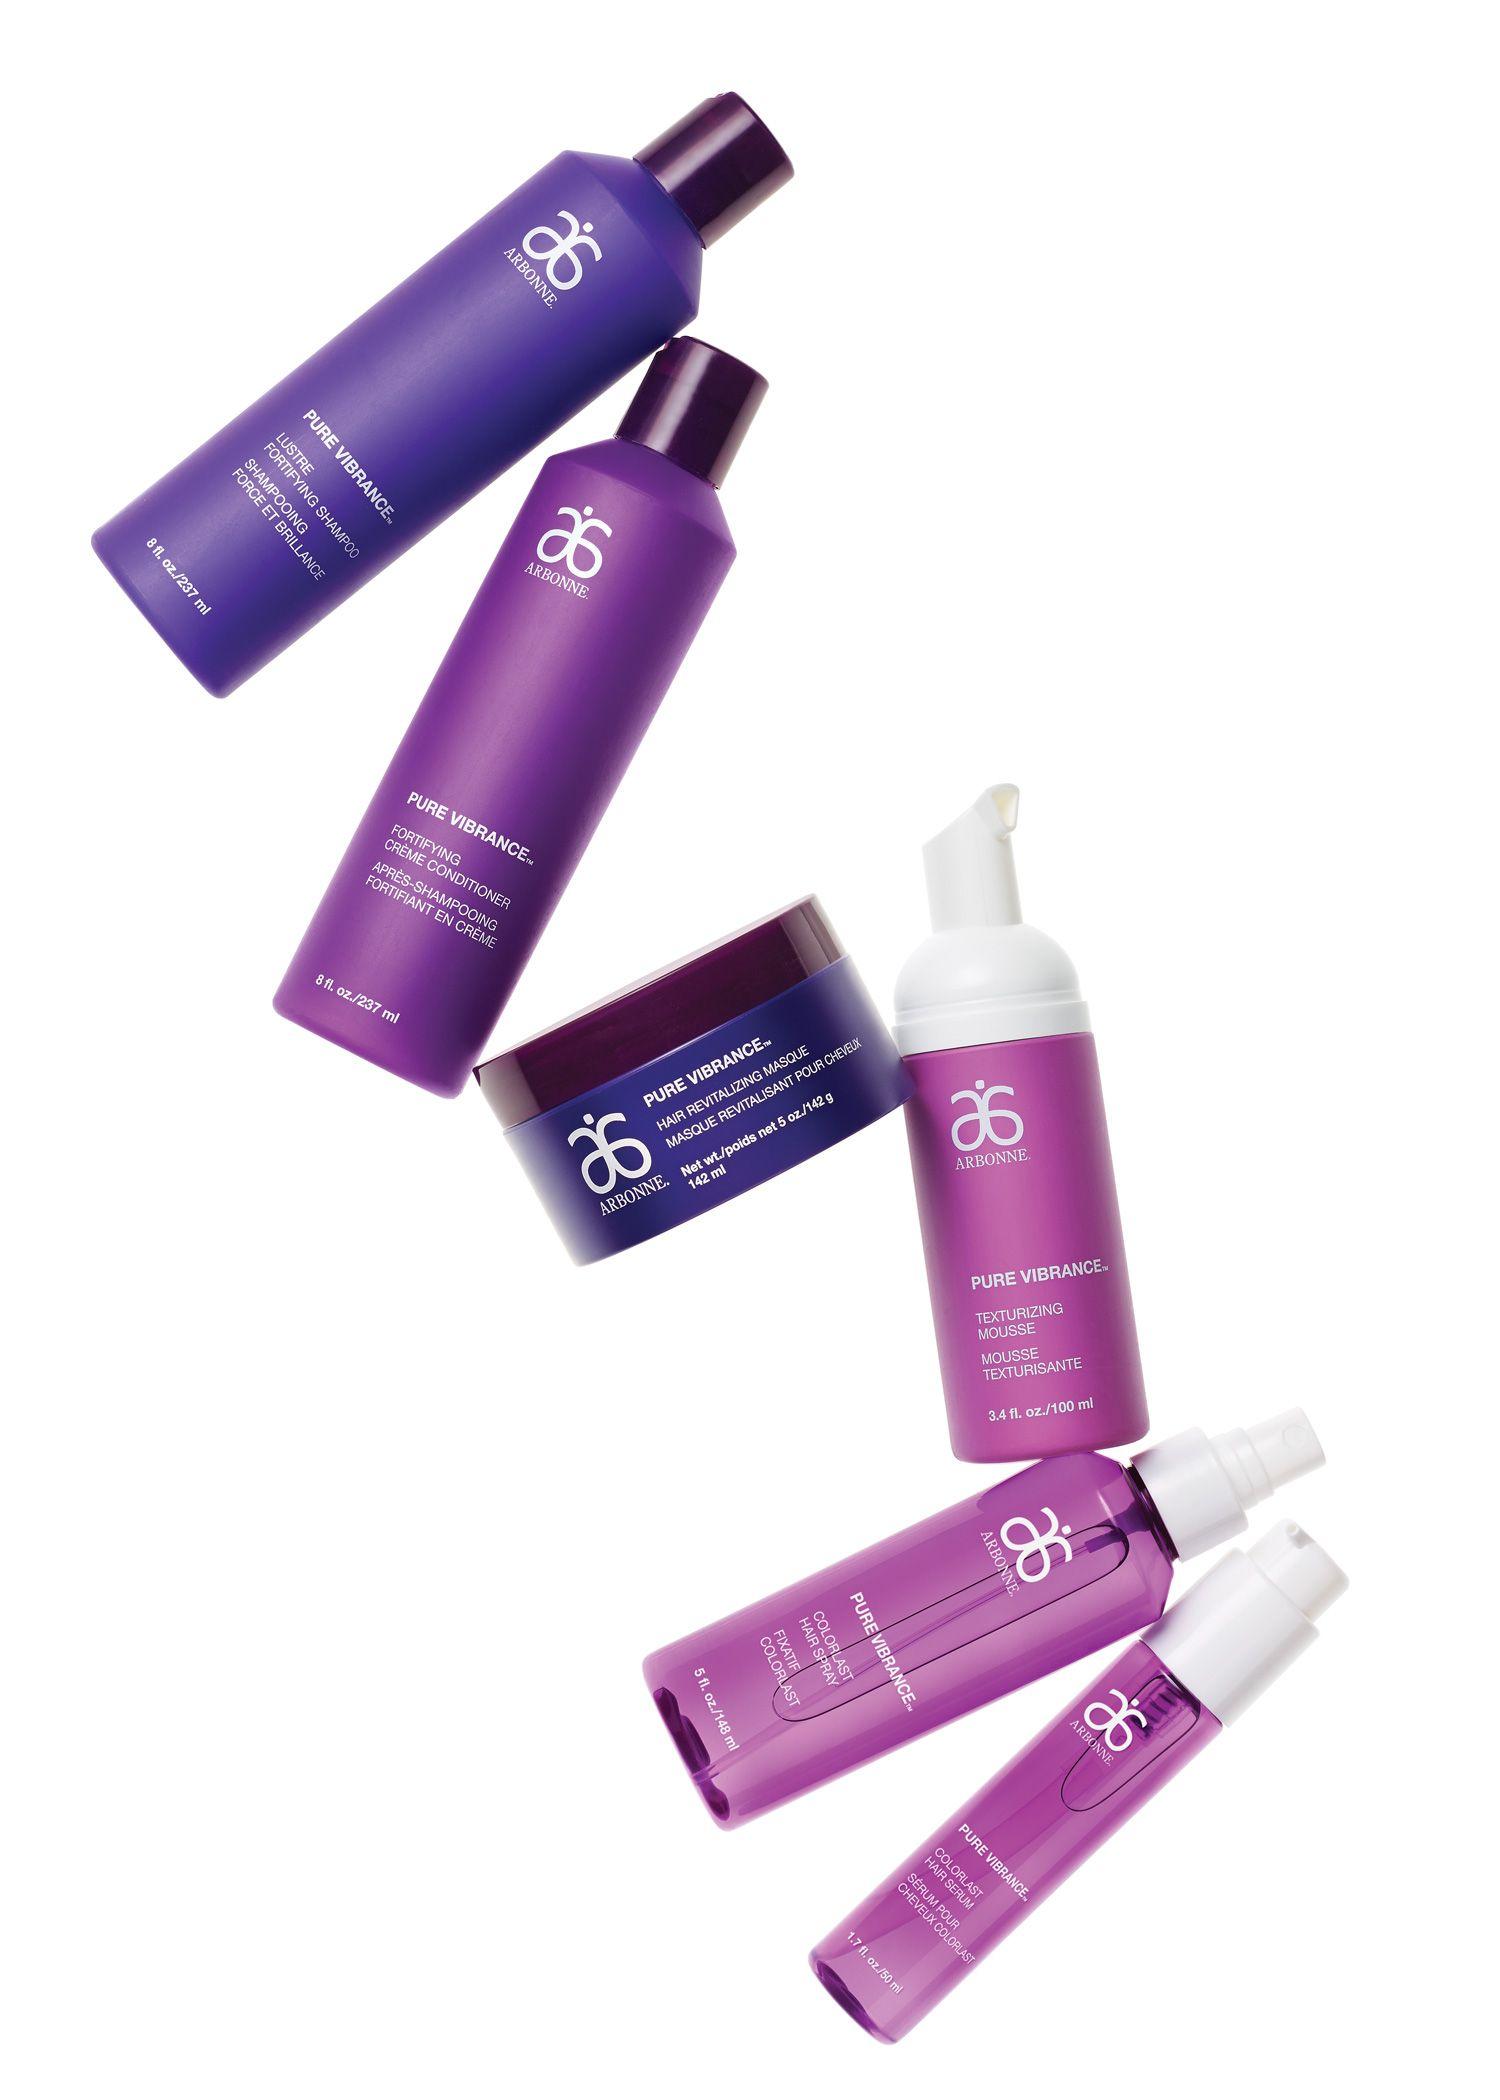 Created for Chemically & Colour treated hair. Pure